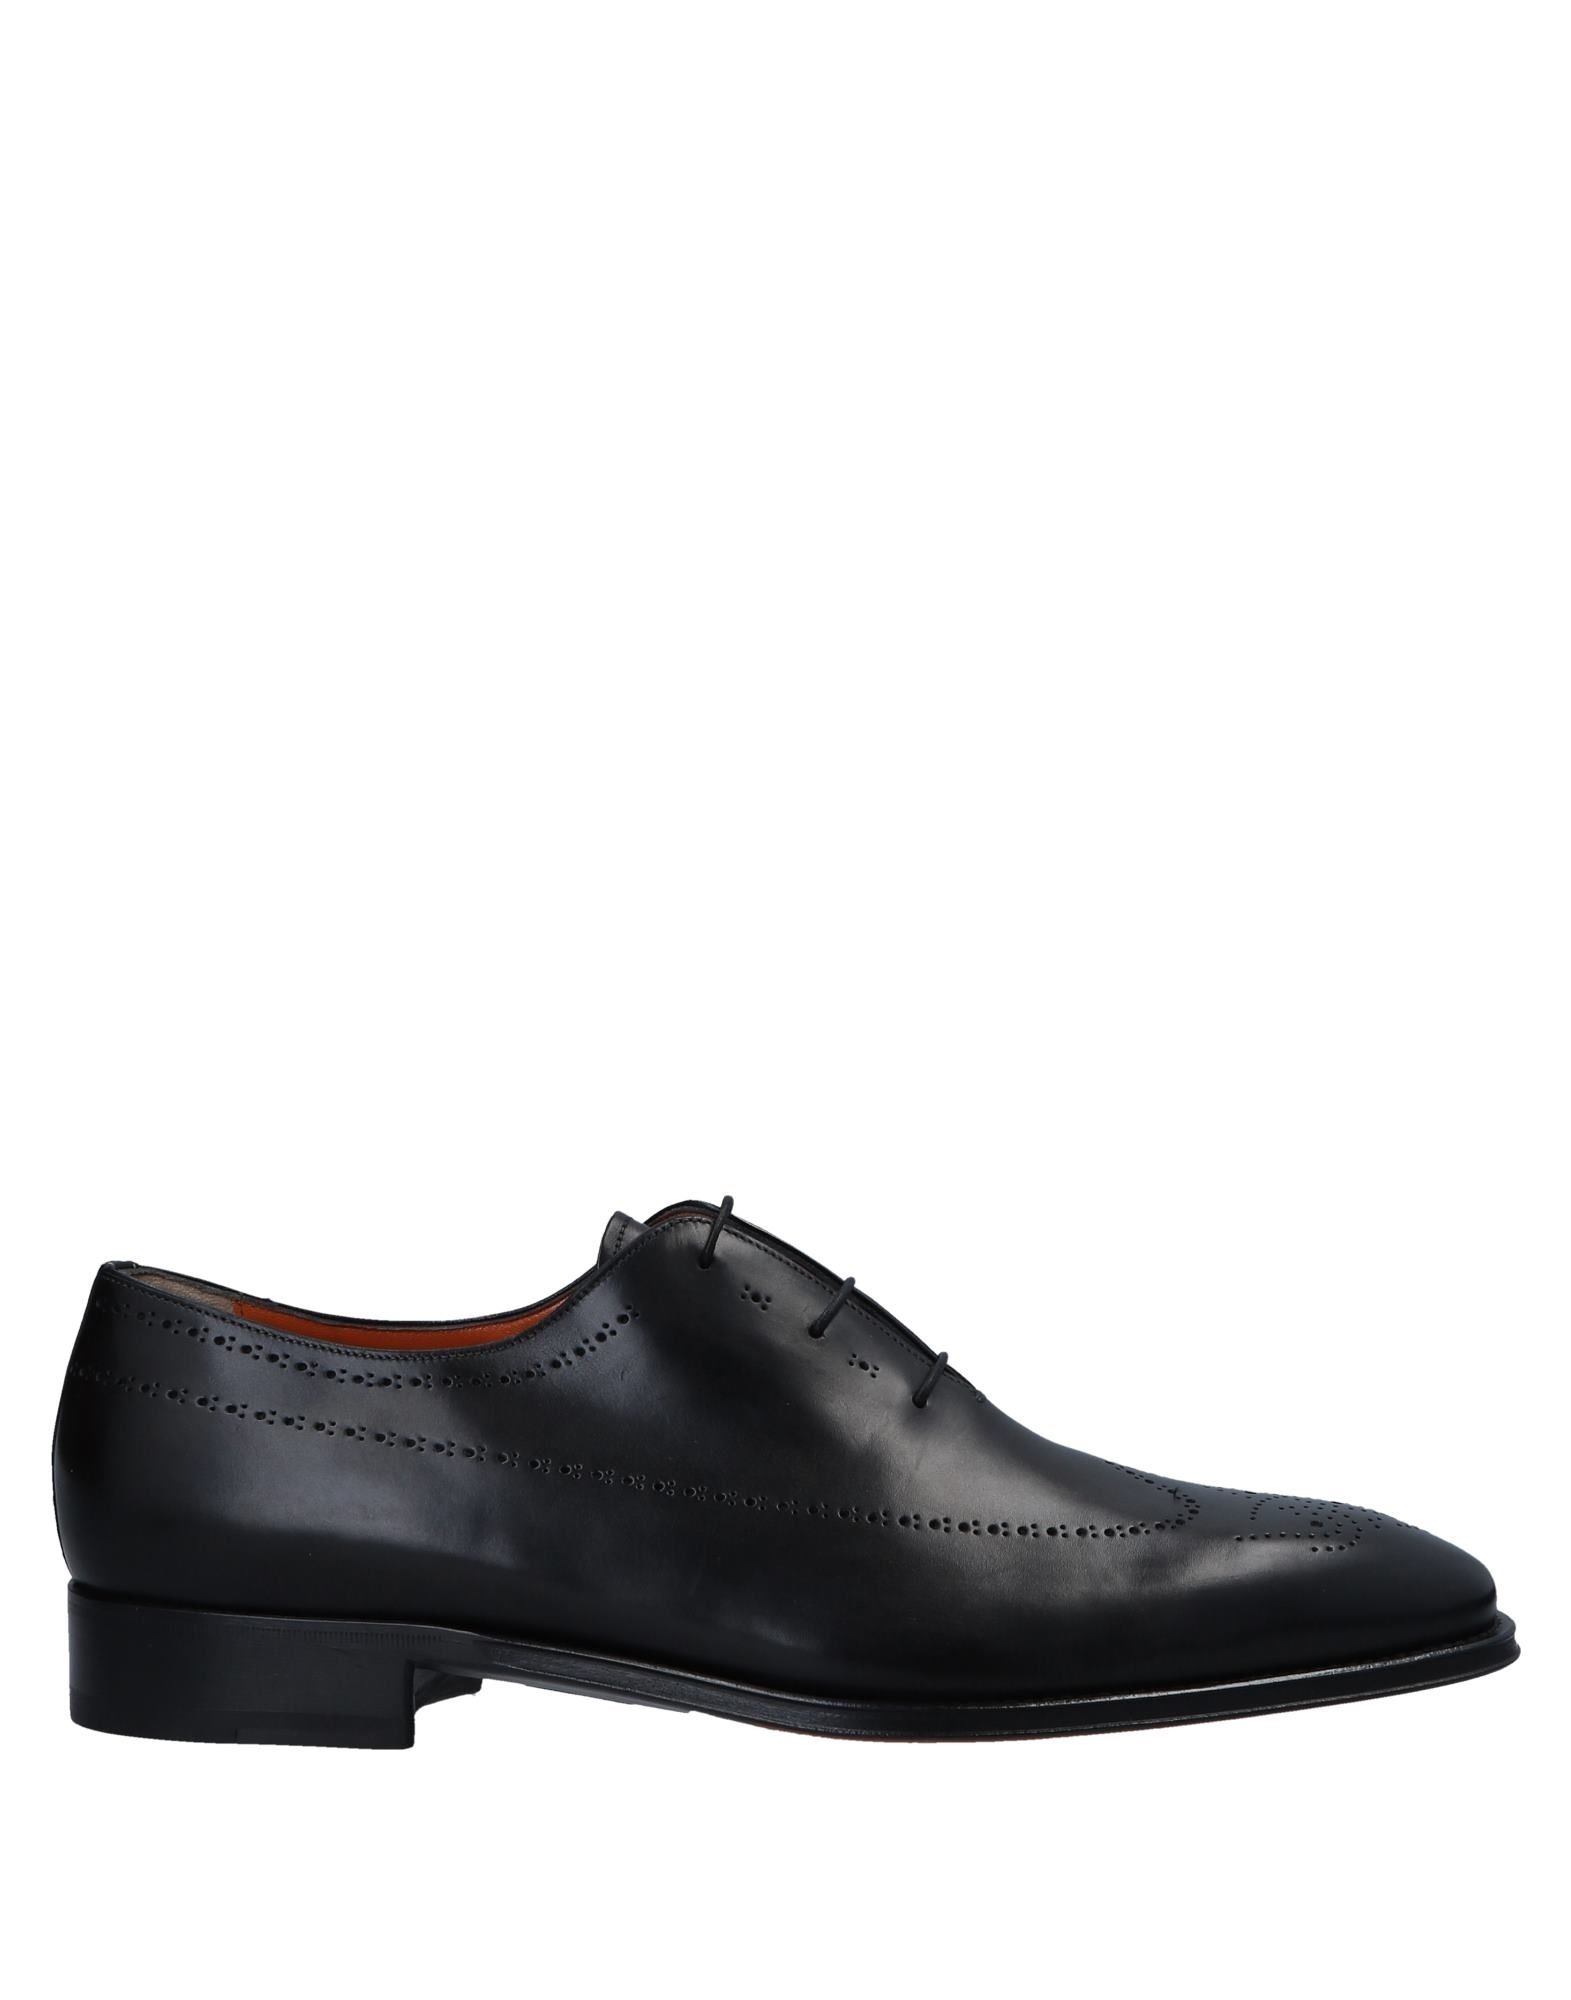 Фото - SANTONI Обувь на шнурках обувь на высокой платформе dkny